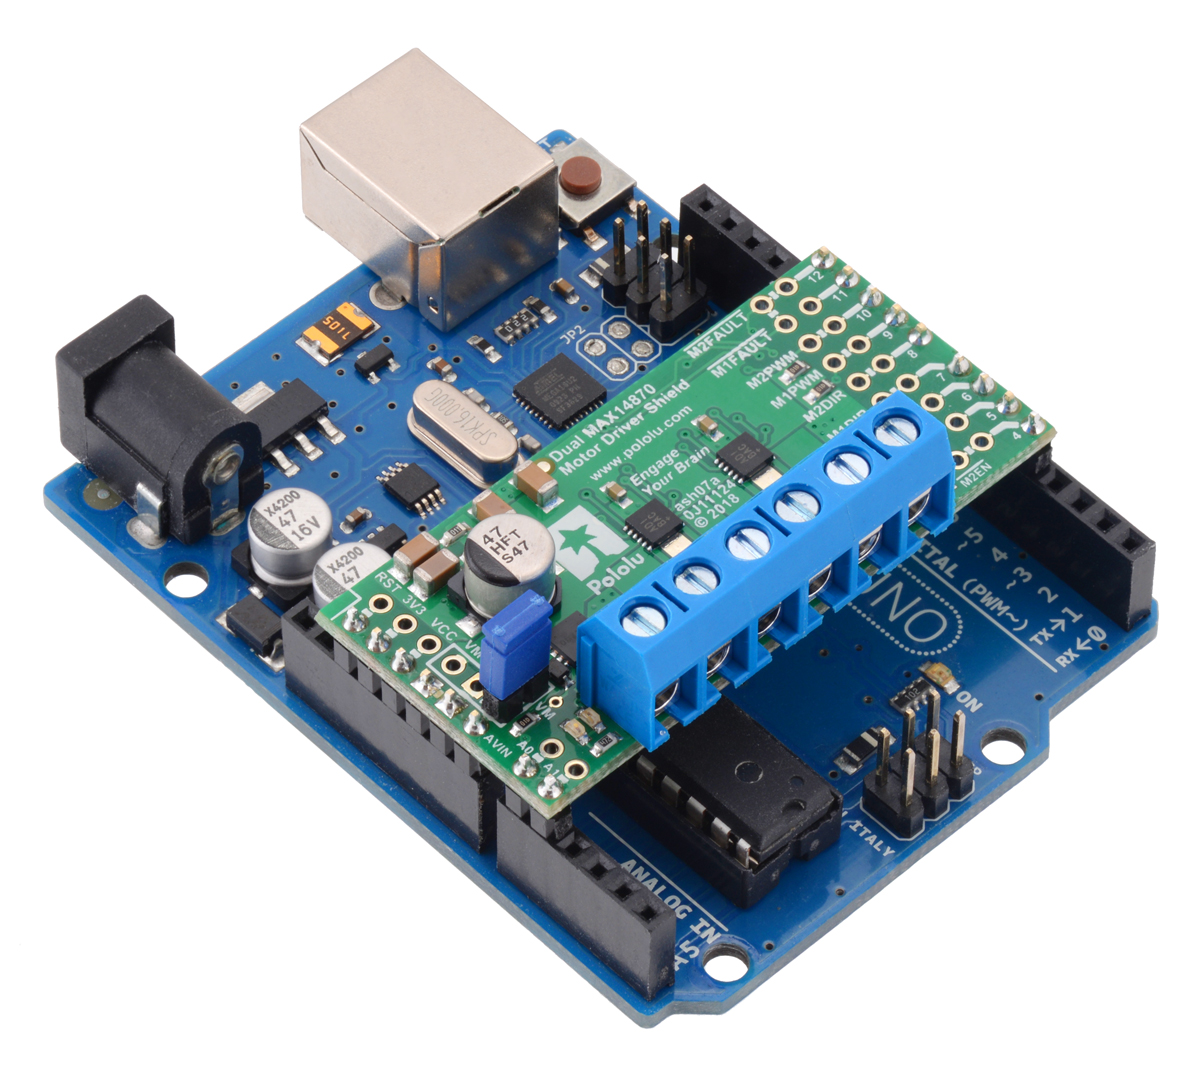 pin 7 arduino 1998 dodge ram 2500 abs wiring diagram pololu dual max14870 motor driver shield for